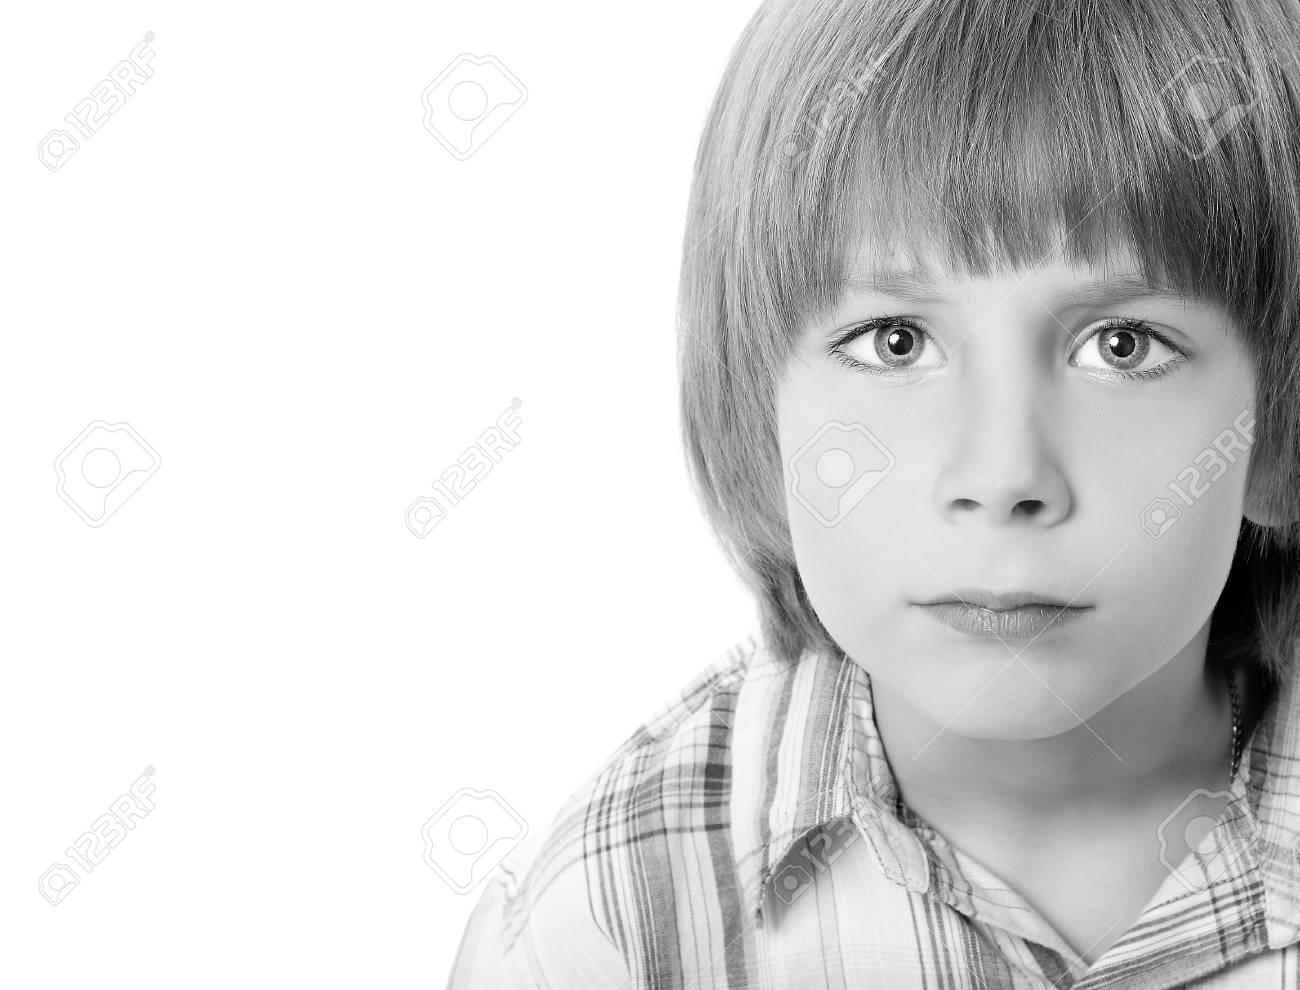 boy troubled isolated on white background Stock Photo - 13590049